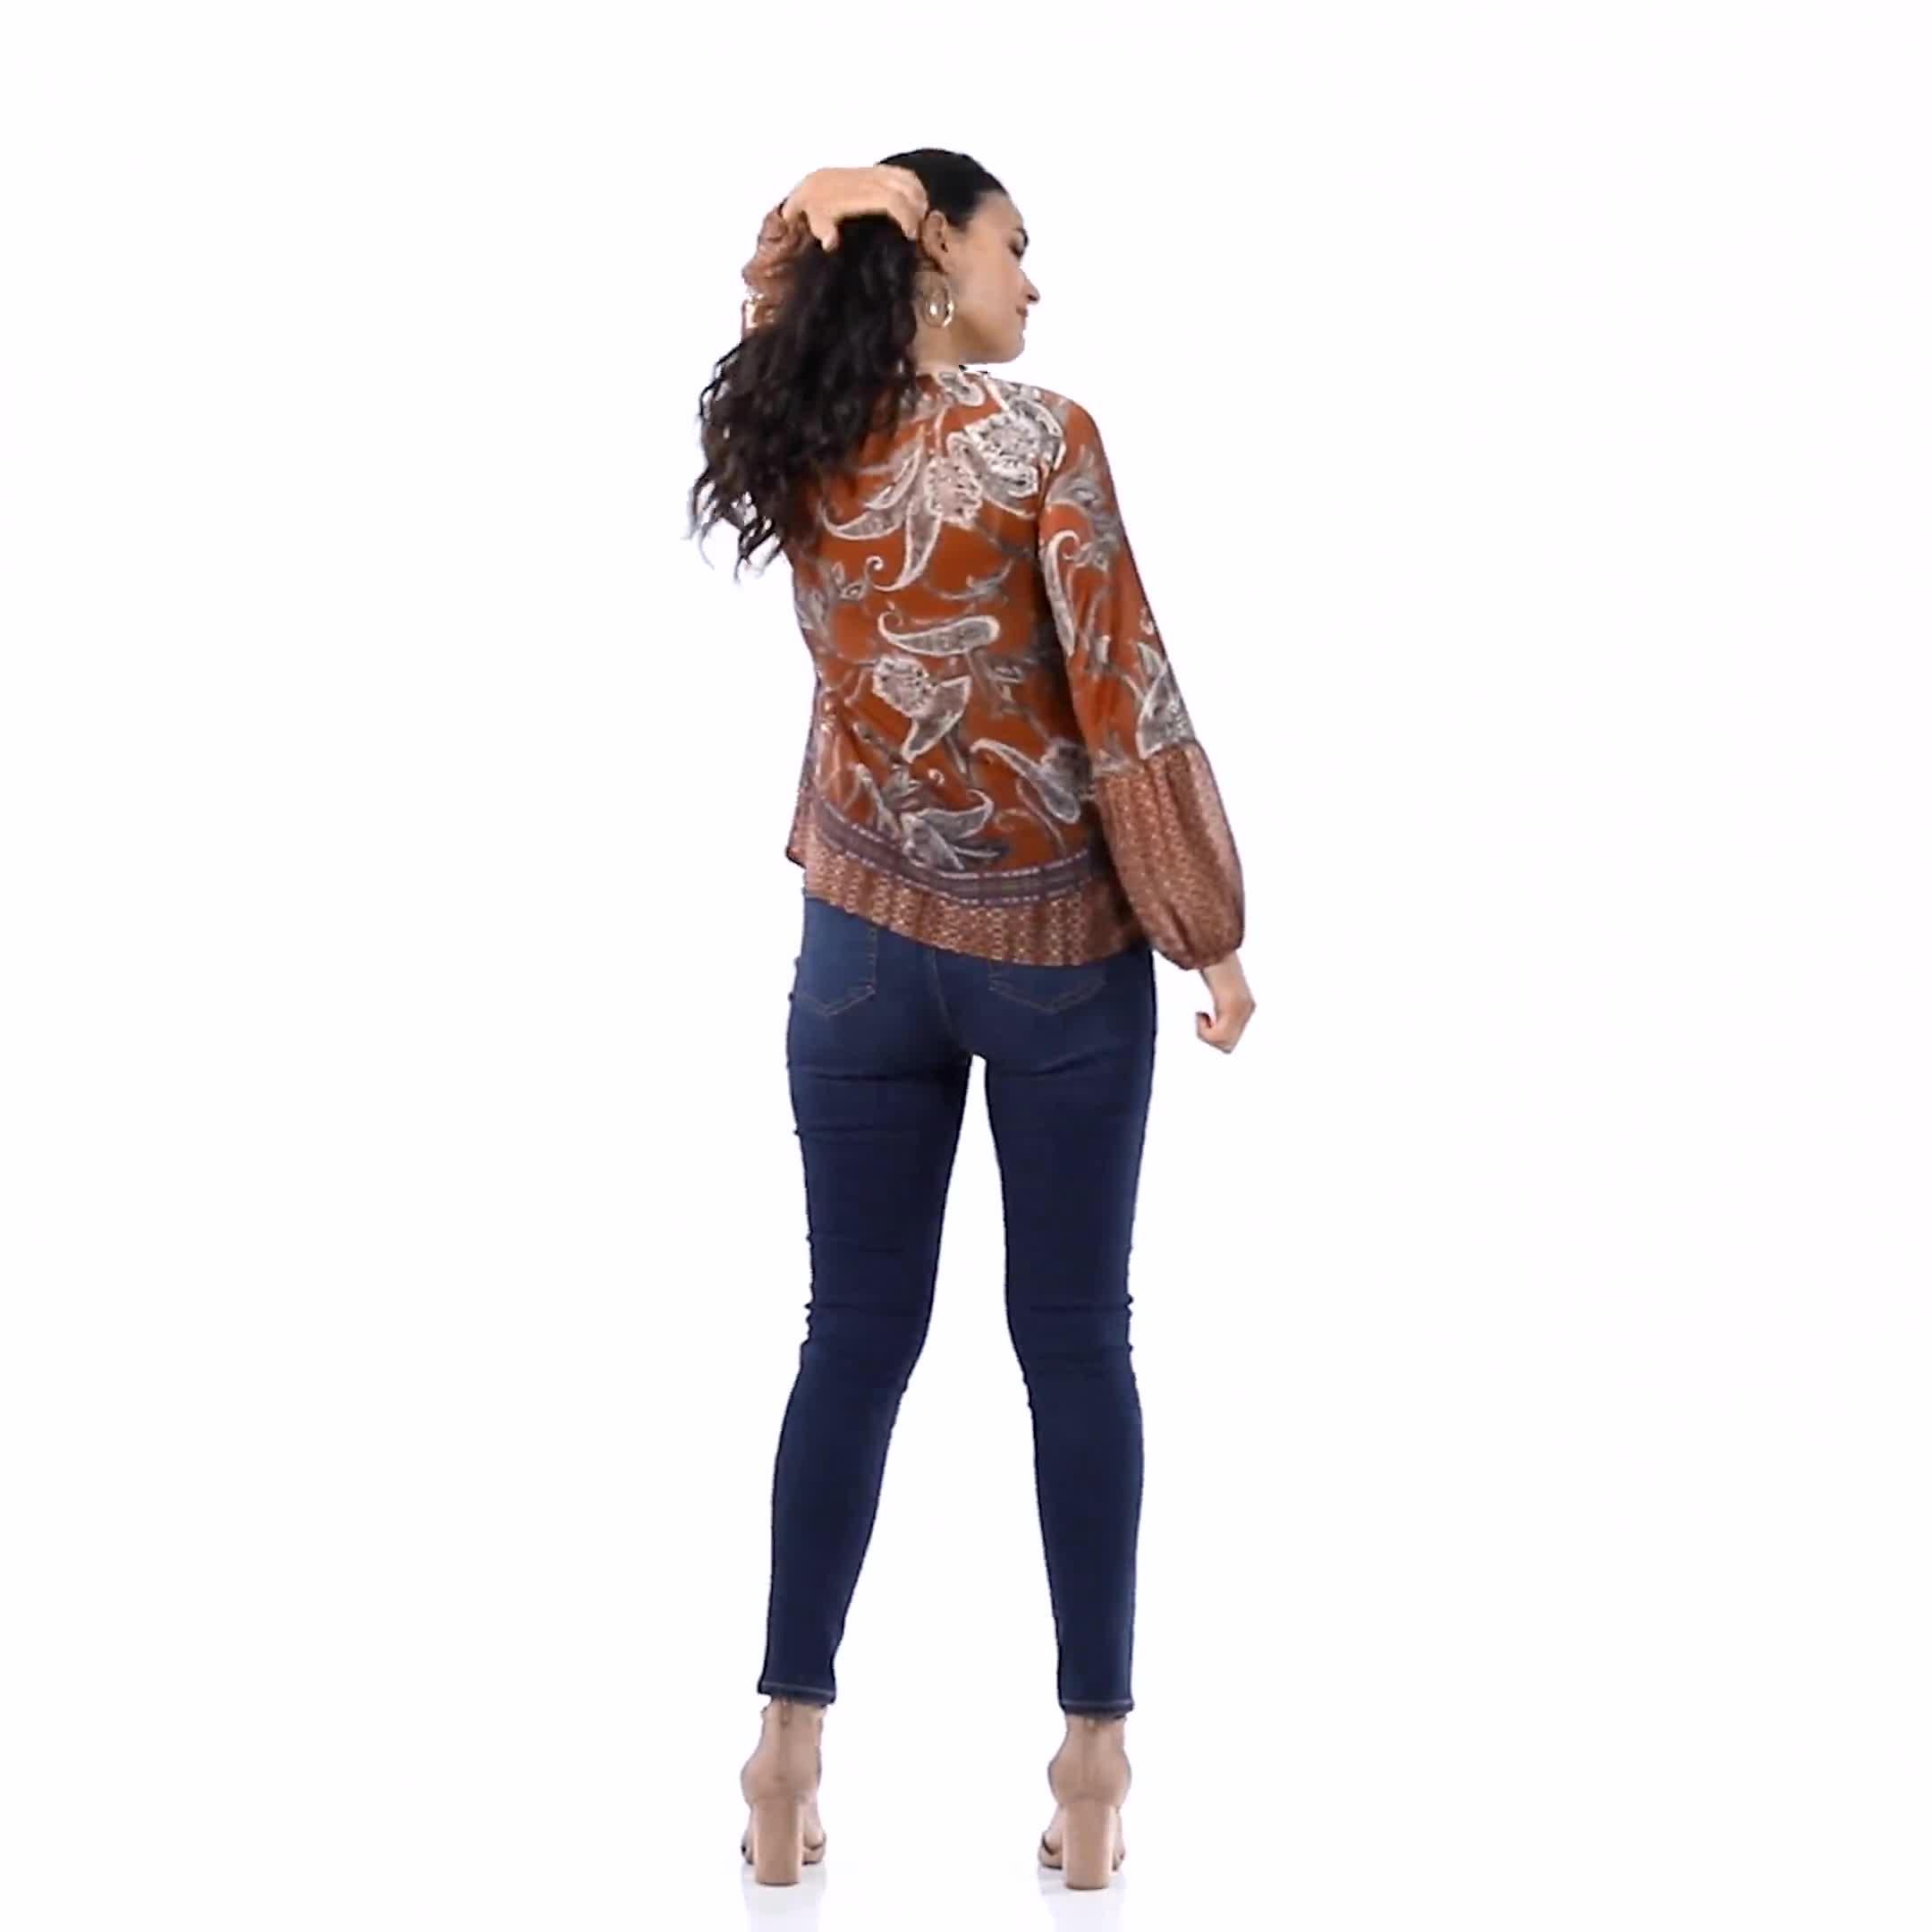 Westport Signature 5 Pocket Skinny Jean - Video